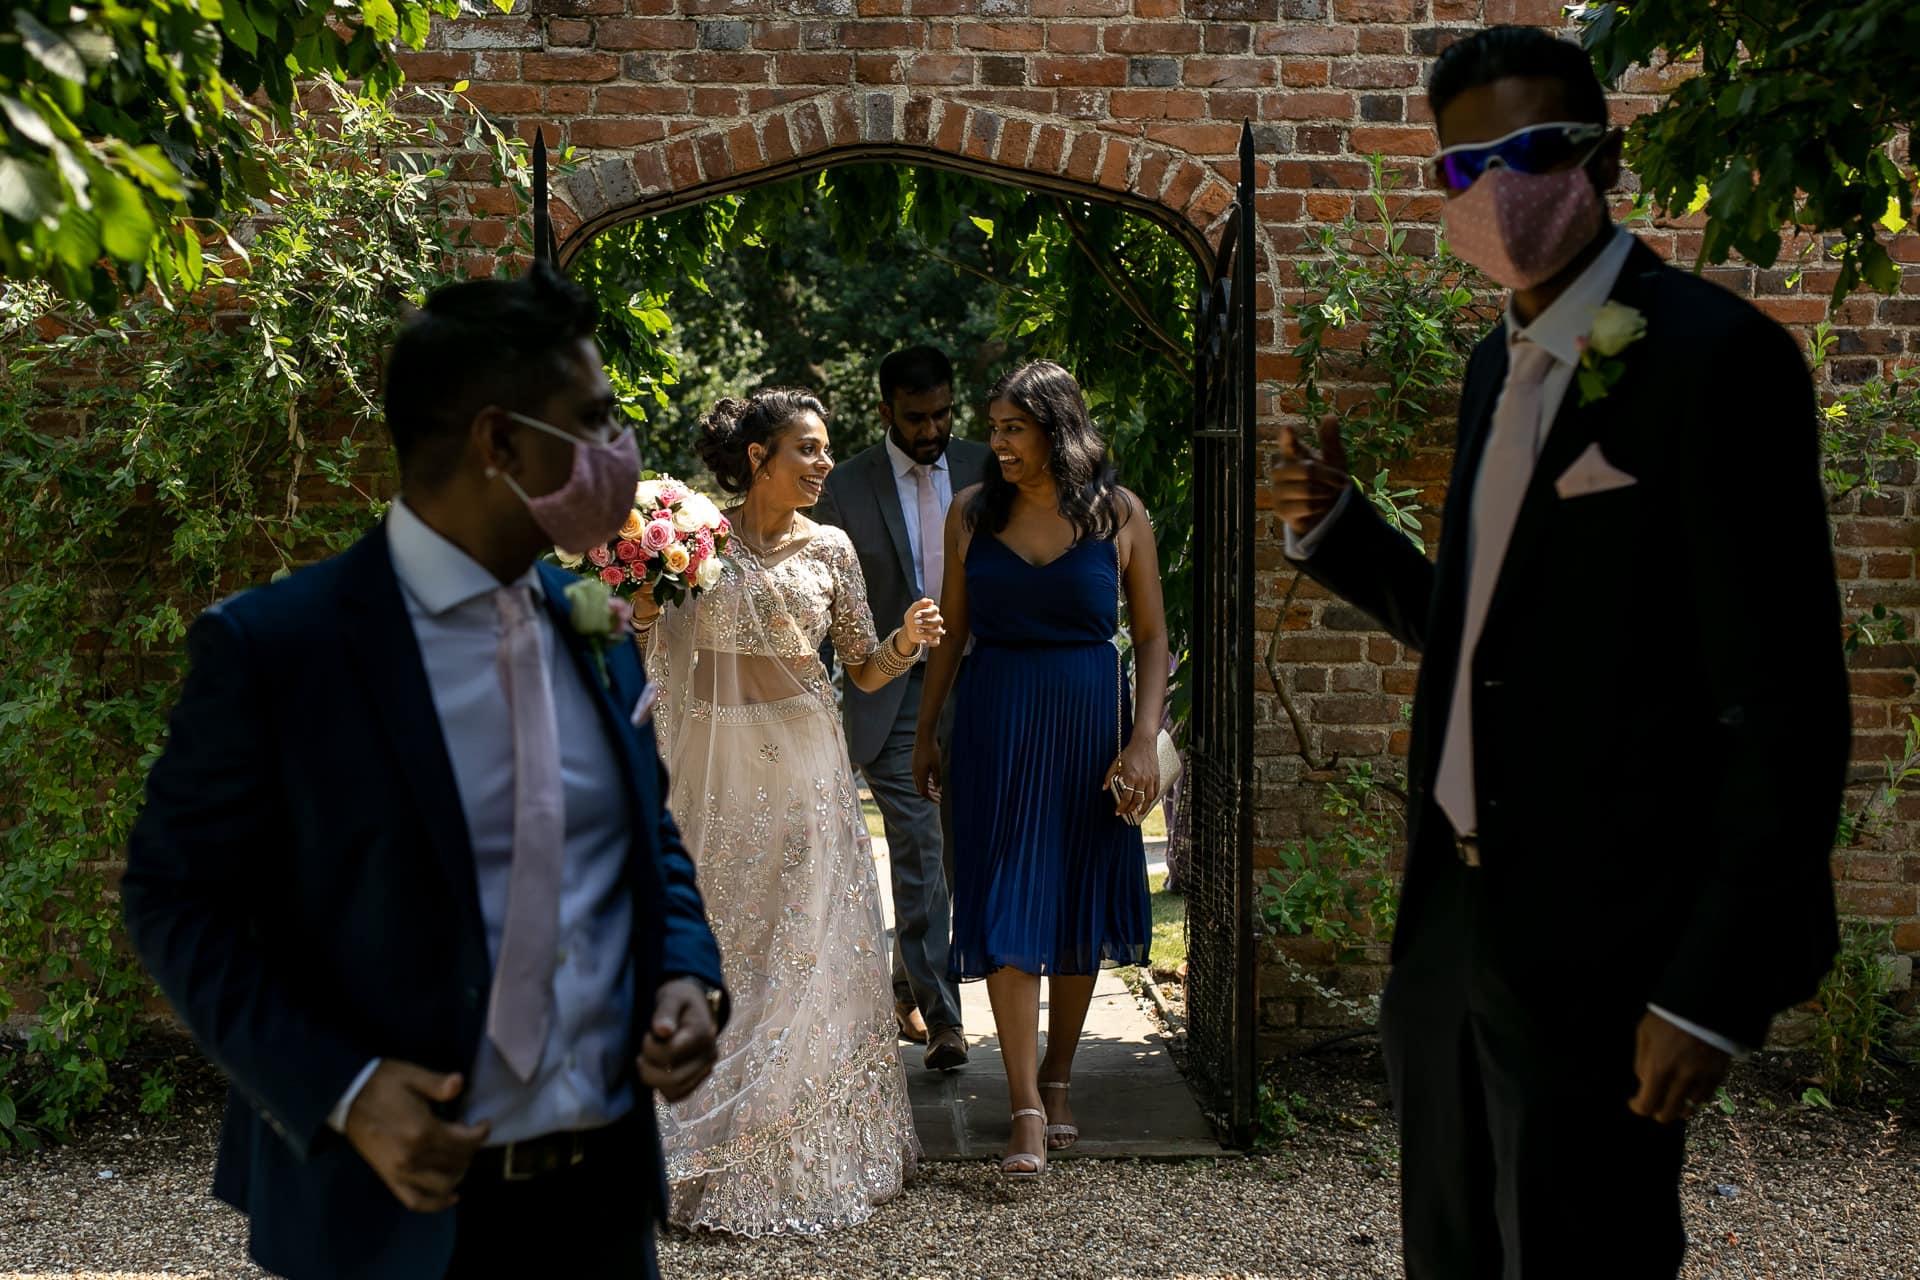 Wedding guest at Civil wedding